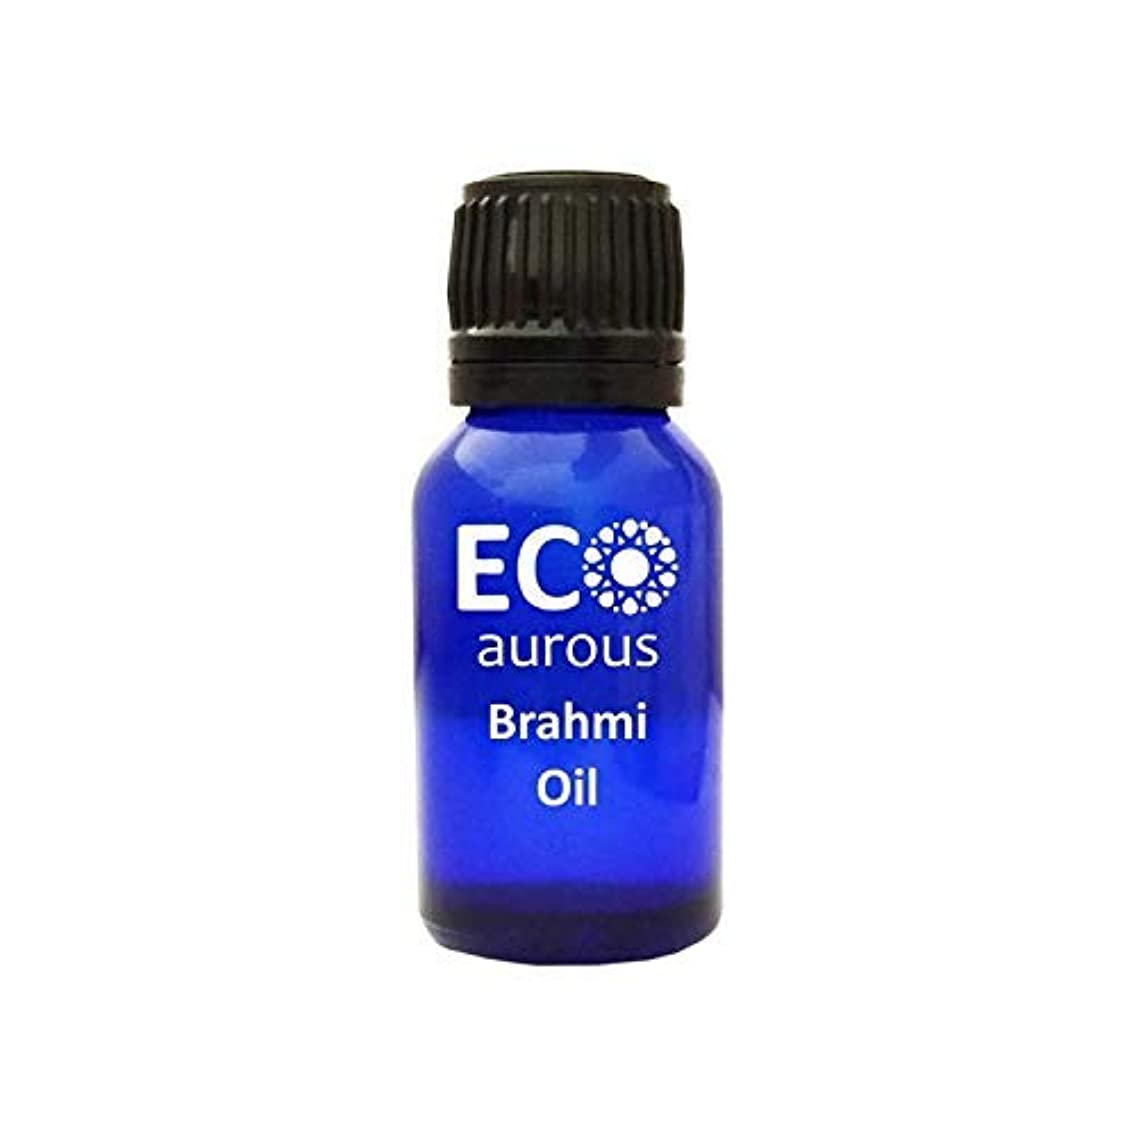 Brahmi Oil 100% Natural, Organic, Vegan & Cruelty Free Brahmi Essential Oil | Pure Brahmi Oil By Eco Aurous